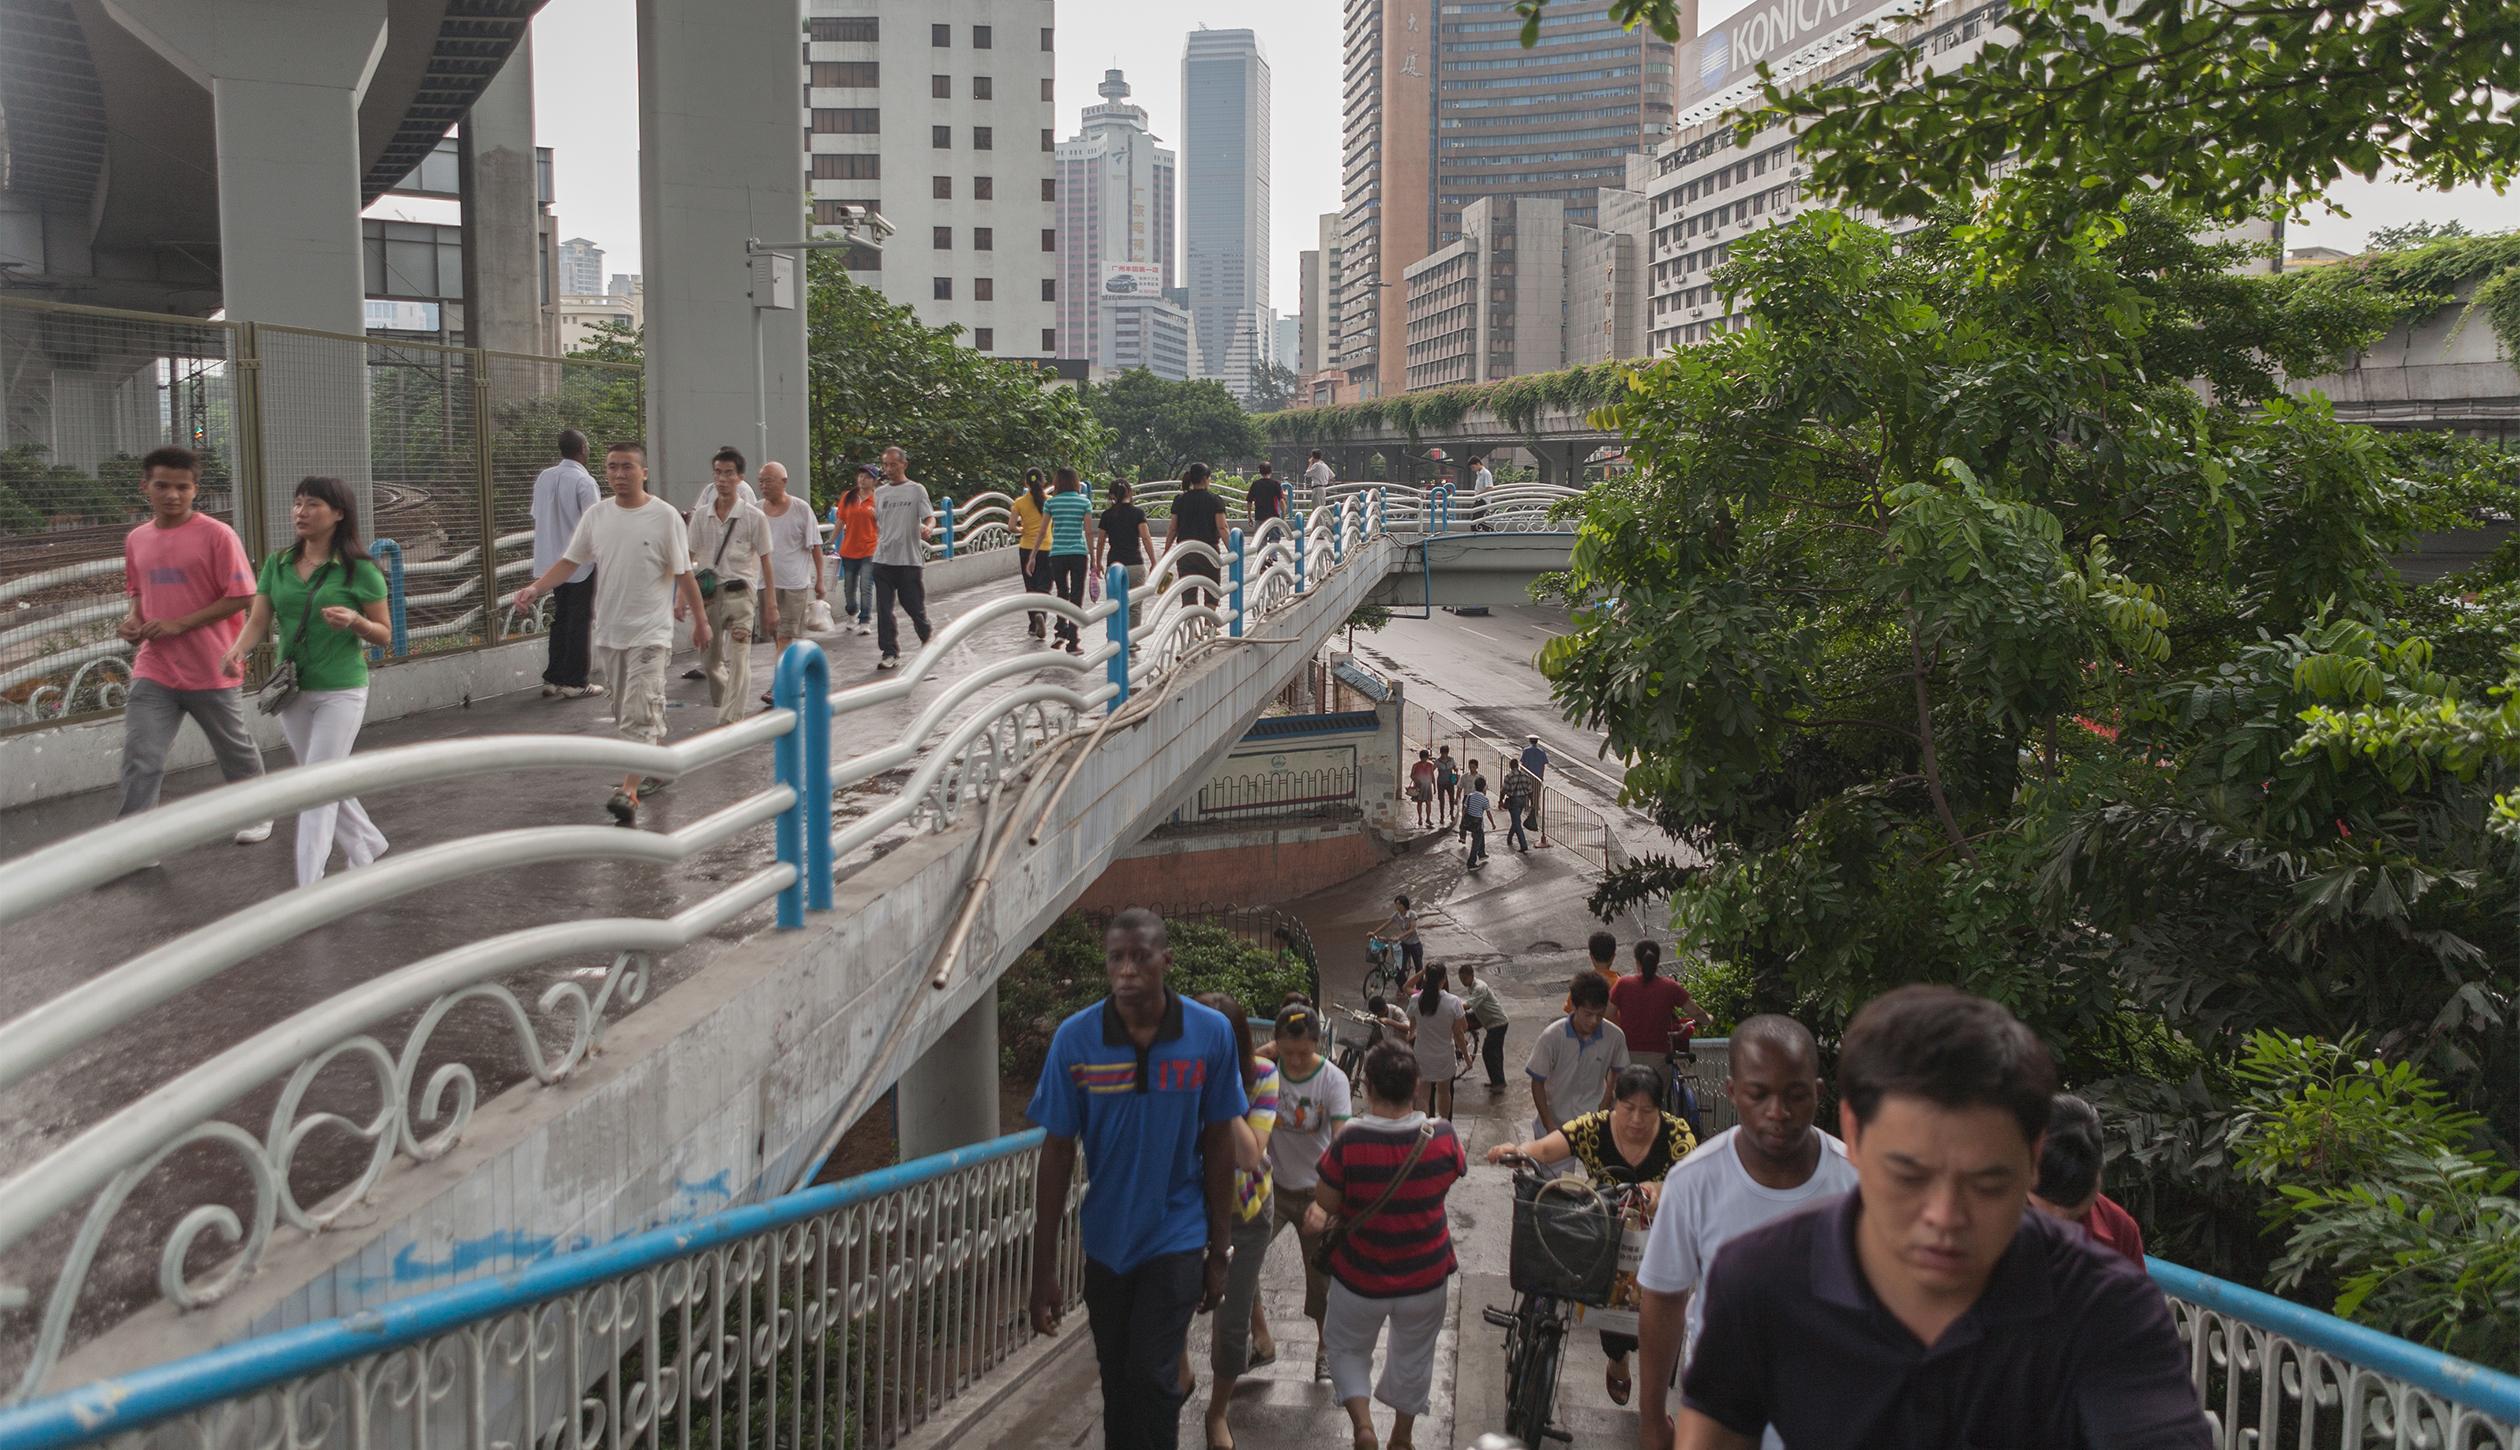 The pedestrian bridge, July 30, 2009